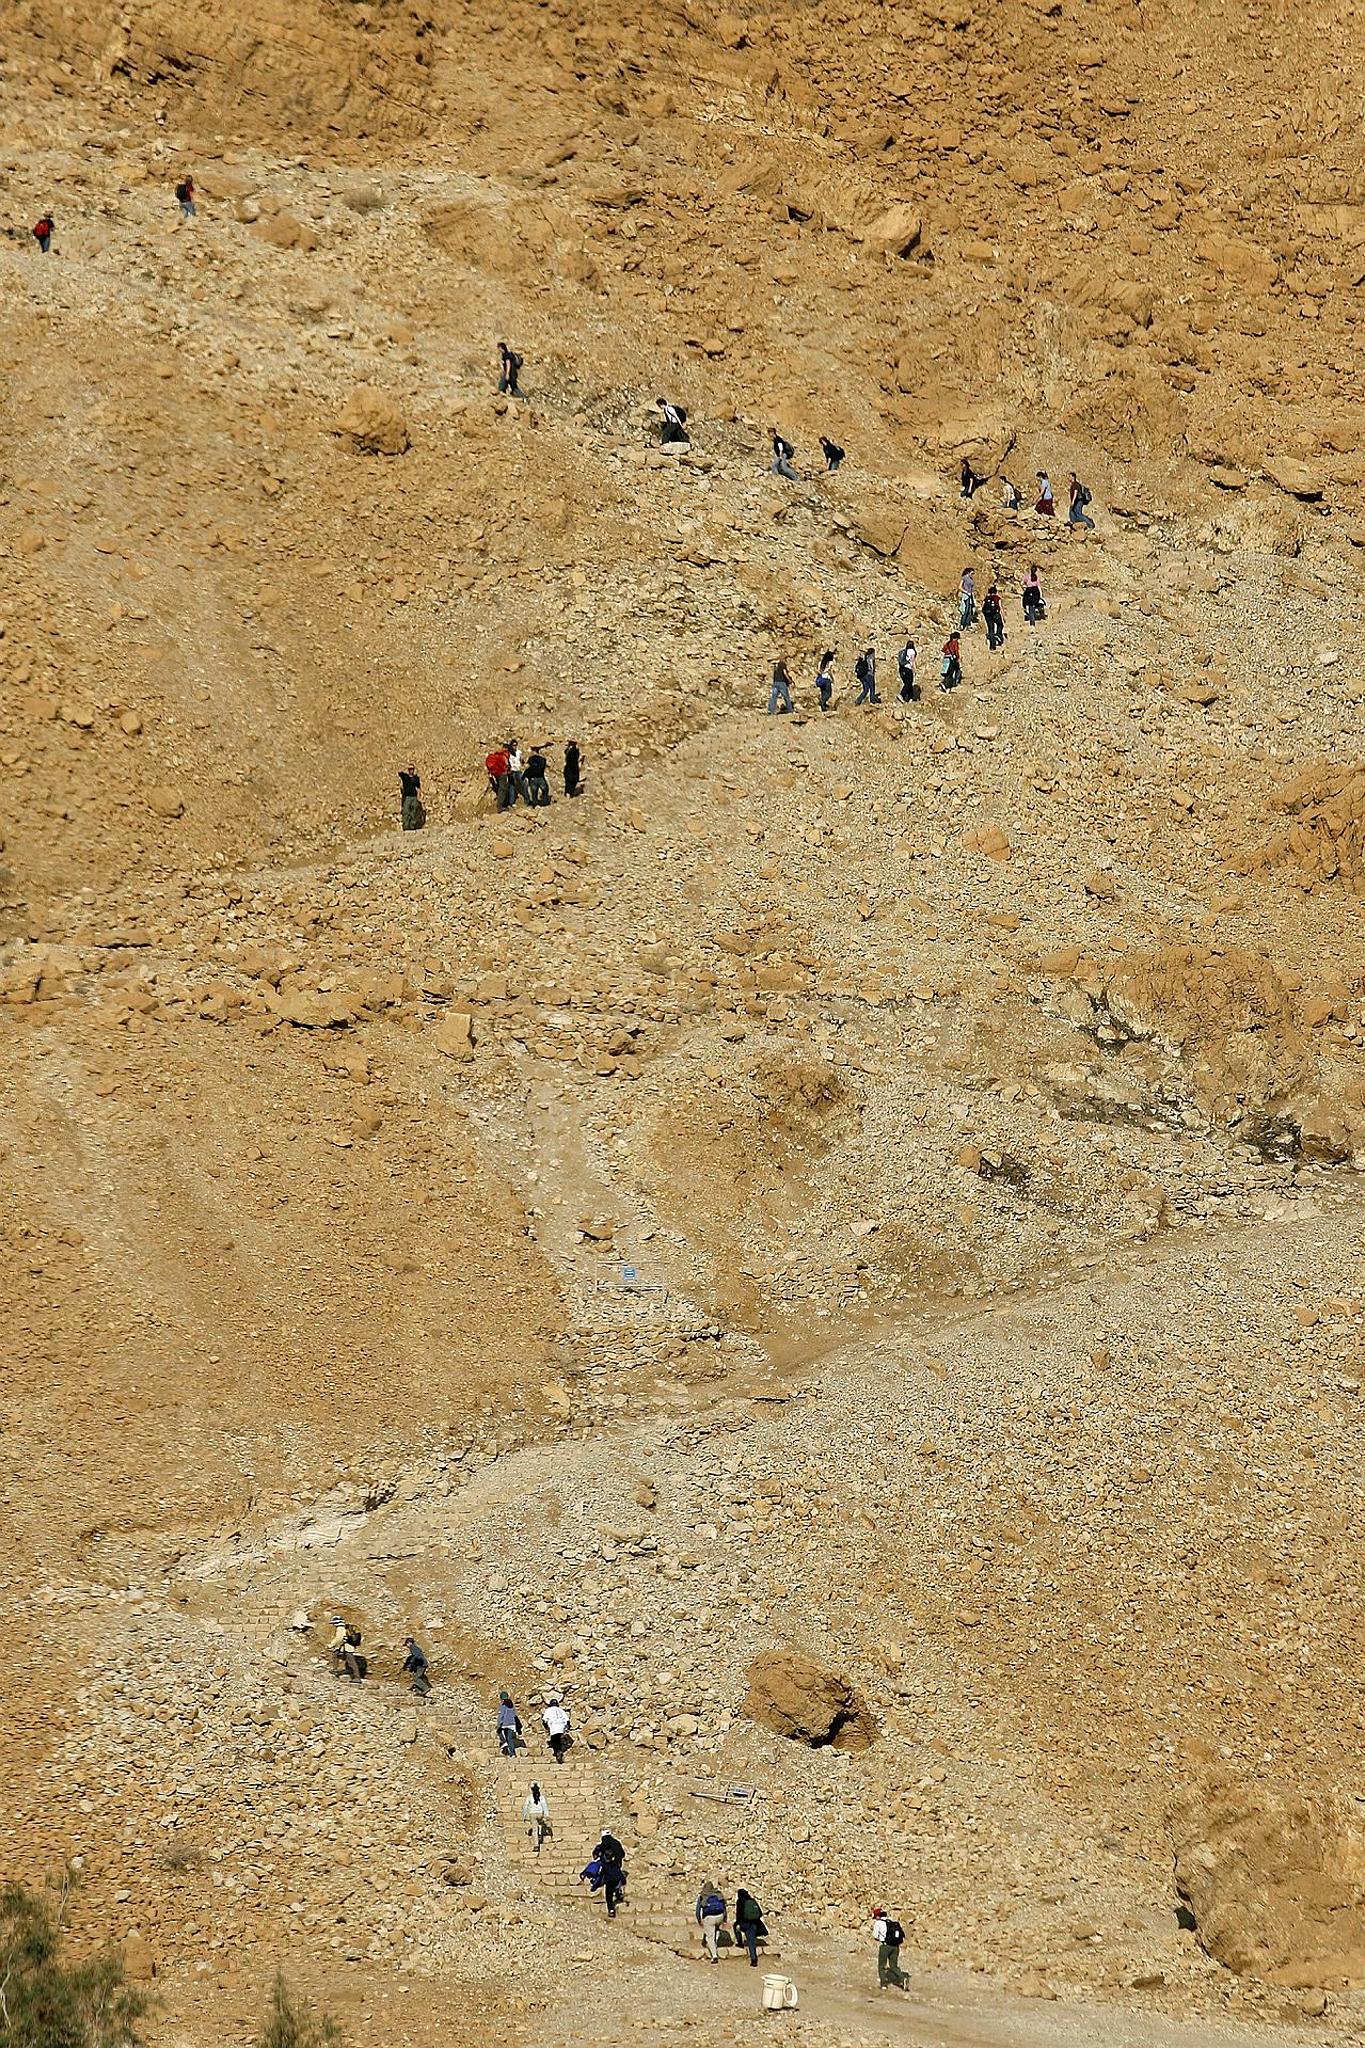 Hiking the snake trail at Masada. Photo by Moshe Shai/Flash90